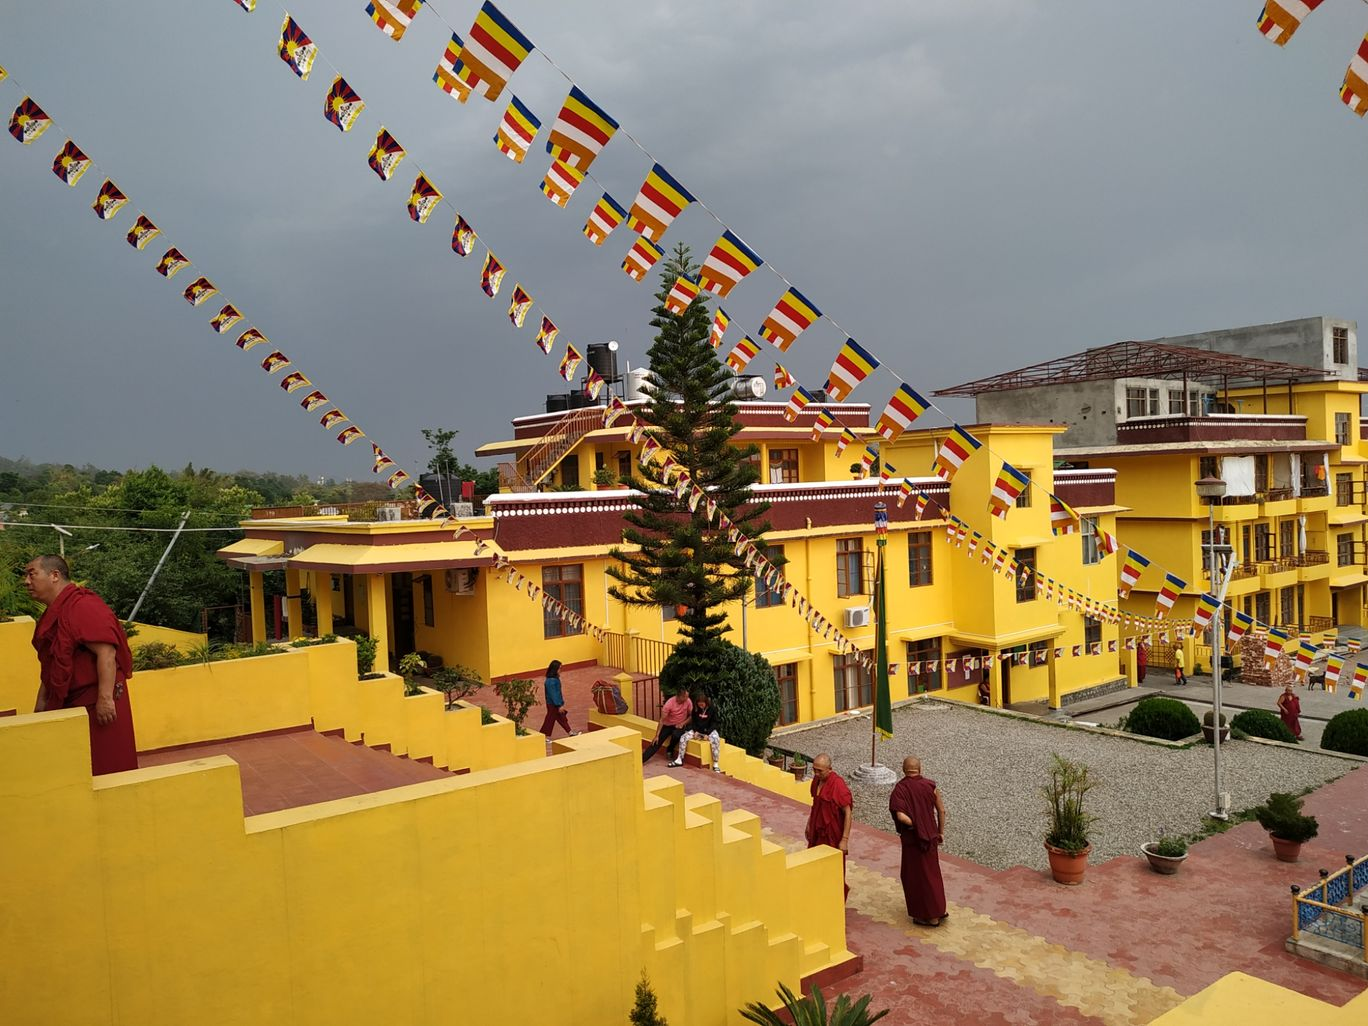 Photo of Gyuto Monastery By Siddharth Shankar